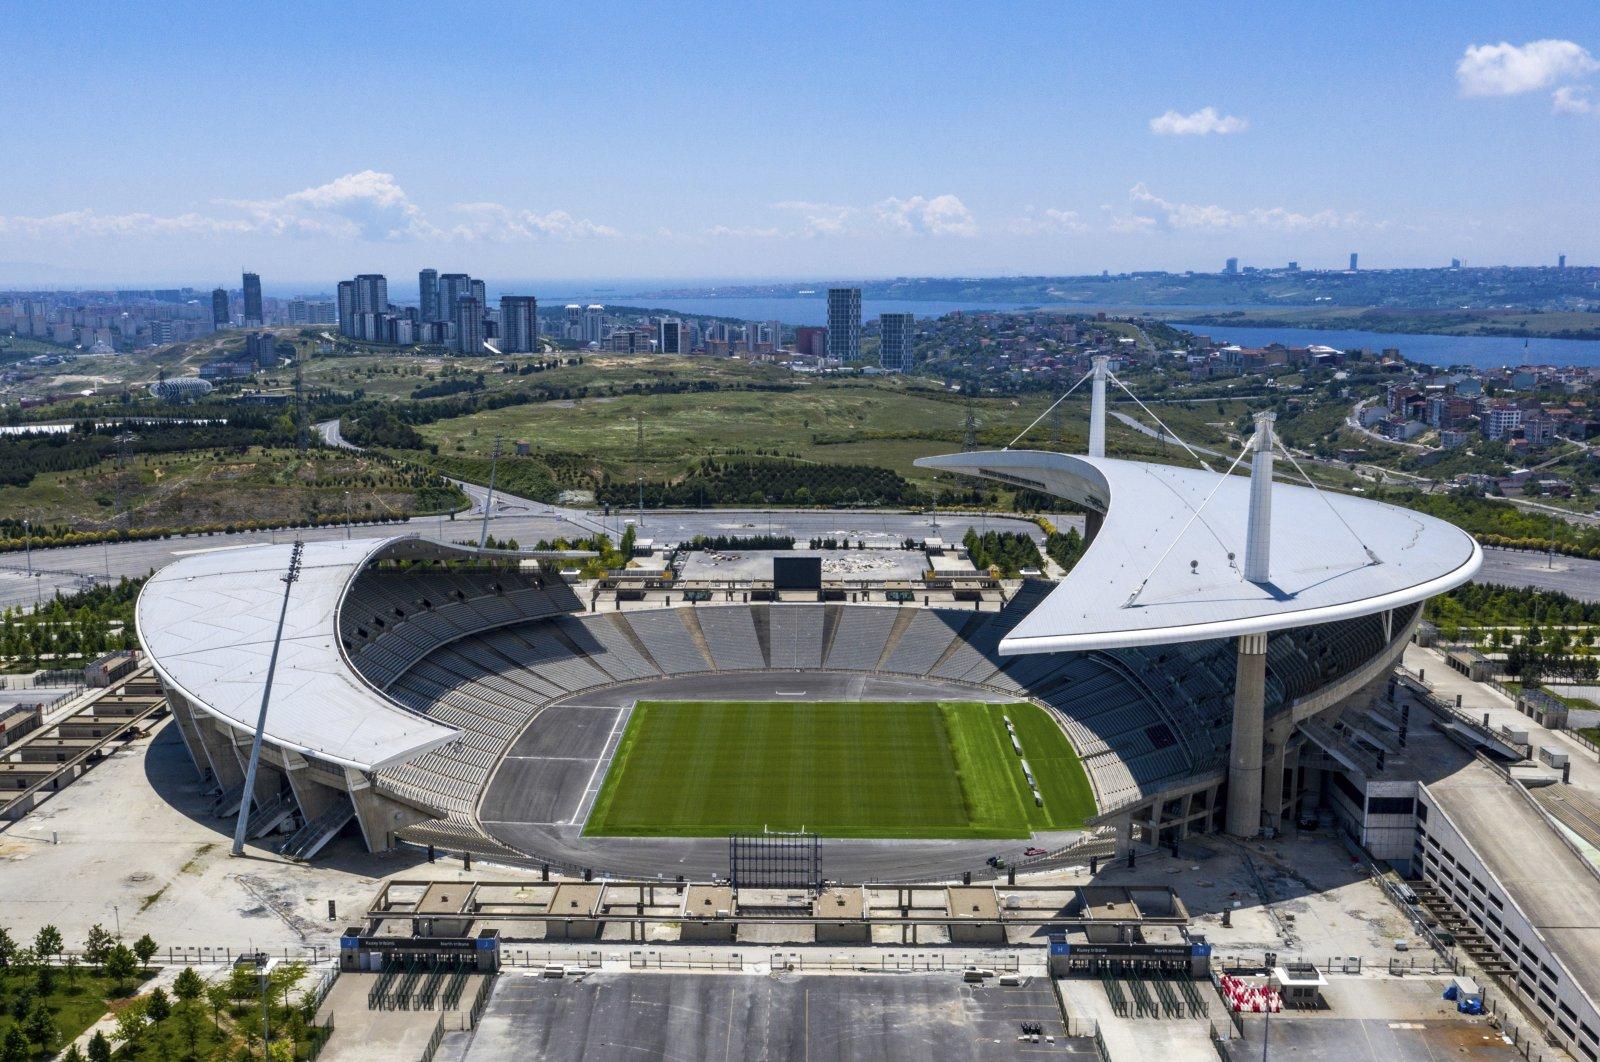 An aerial view of Atatürk Olympic Stadium, Istanbul, Turkey, May 30, 2020. (AP Photo)